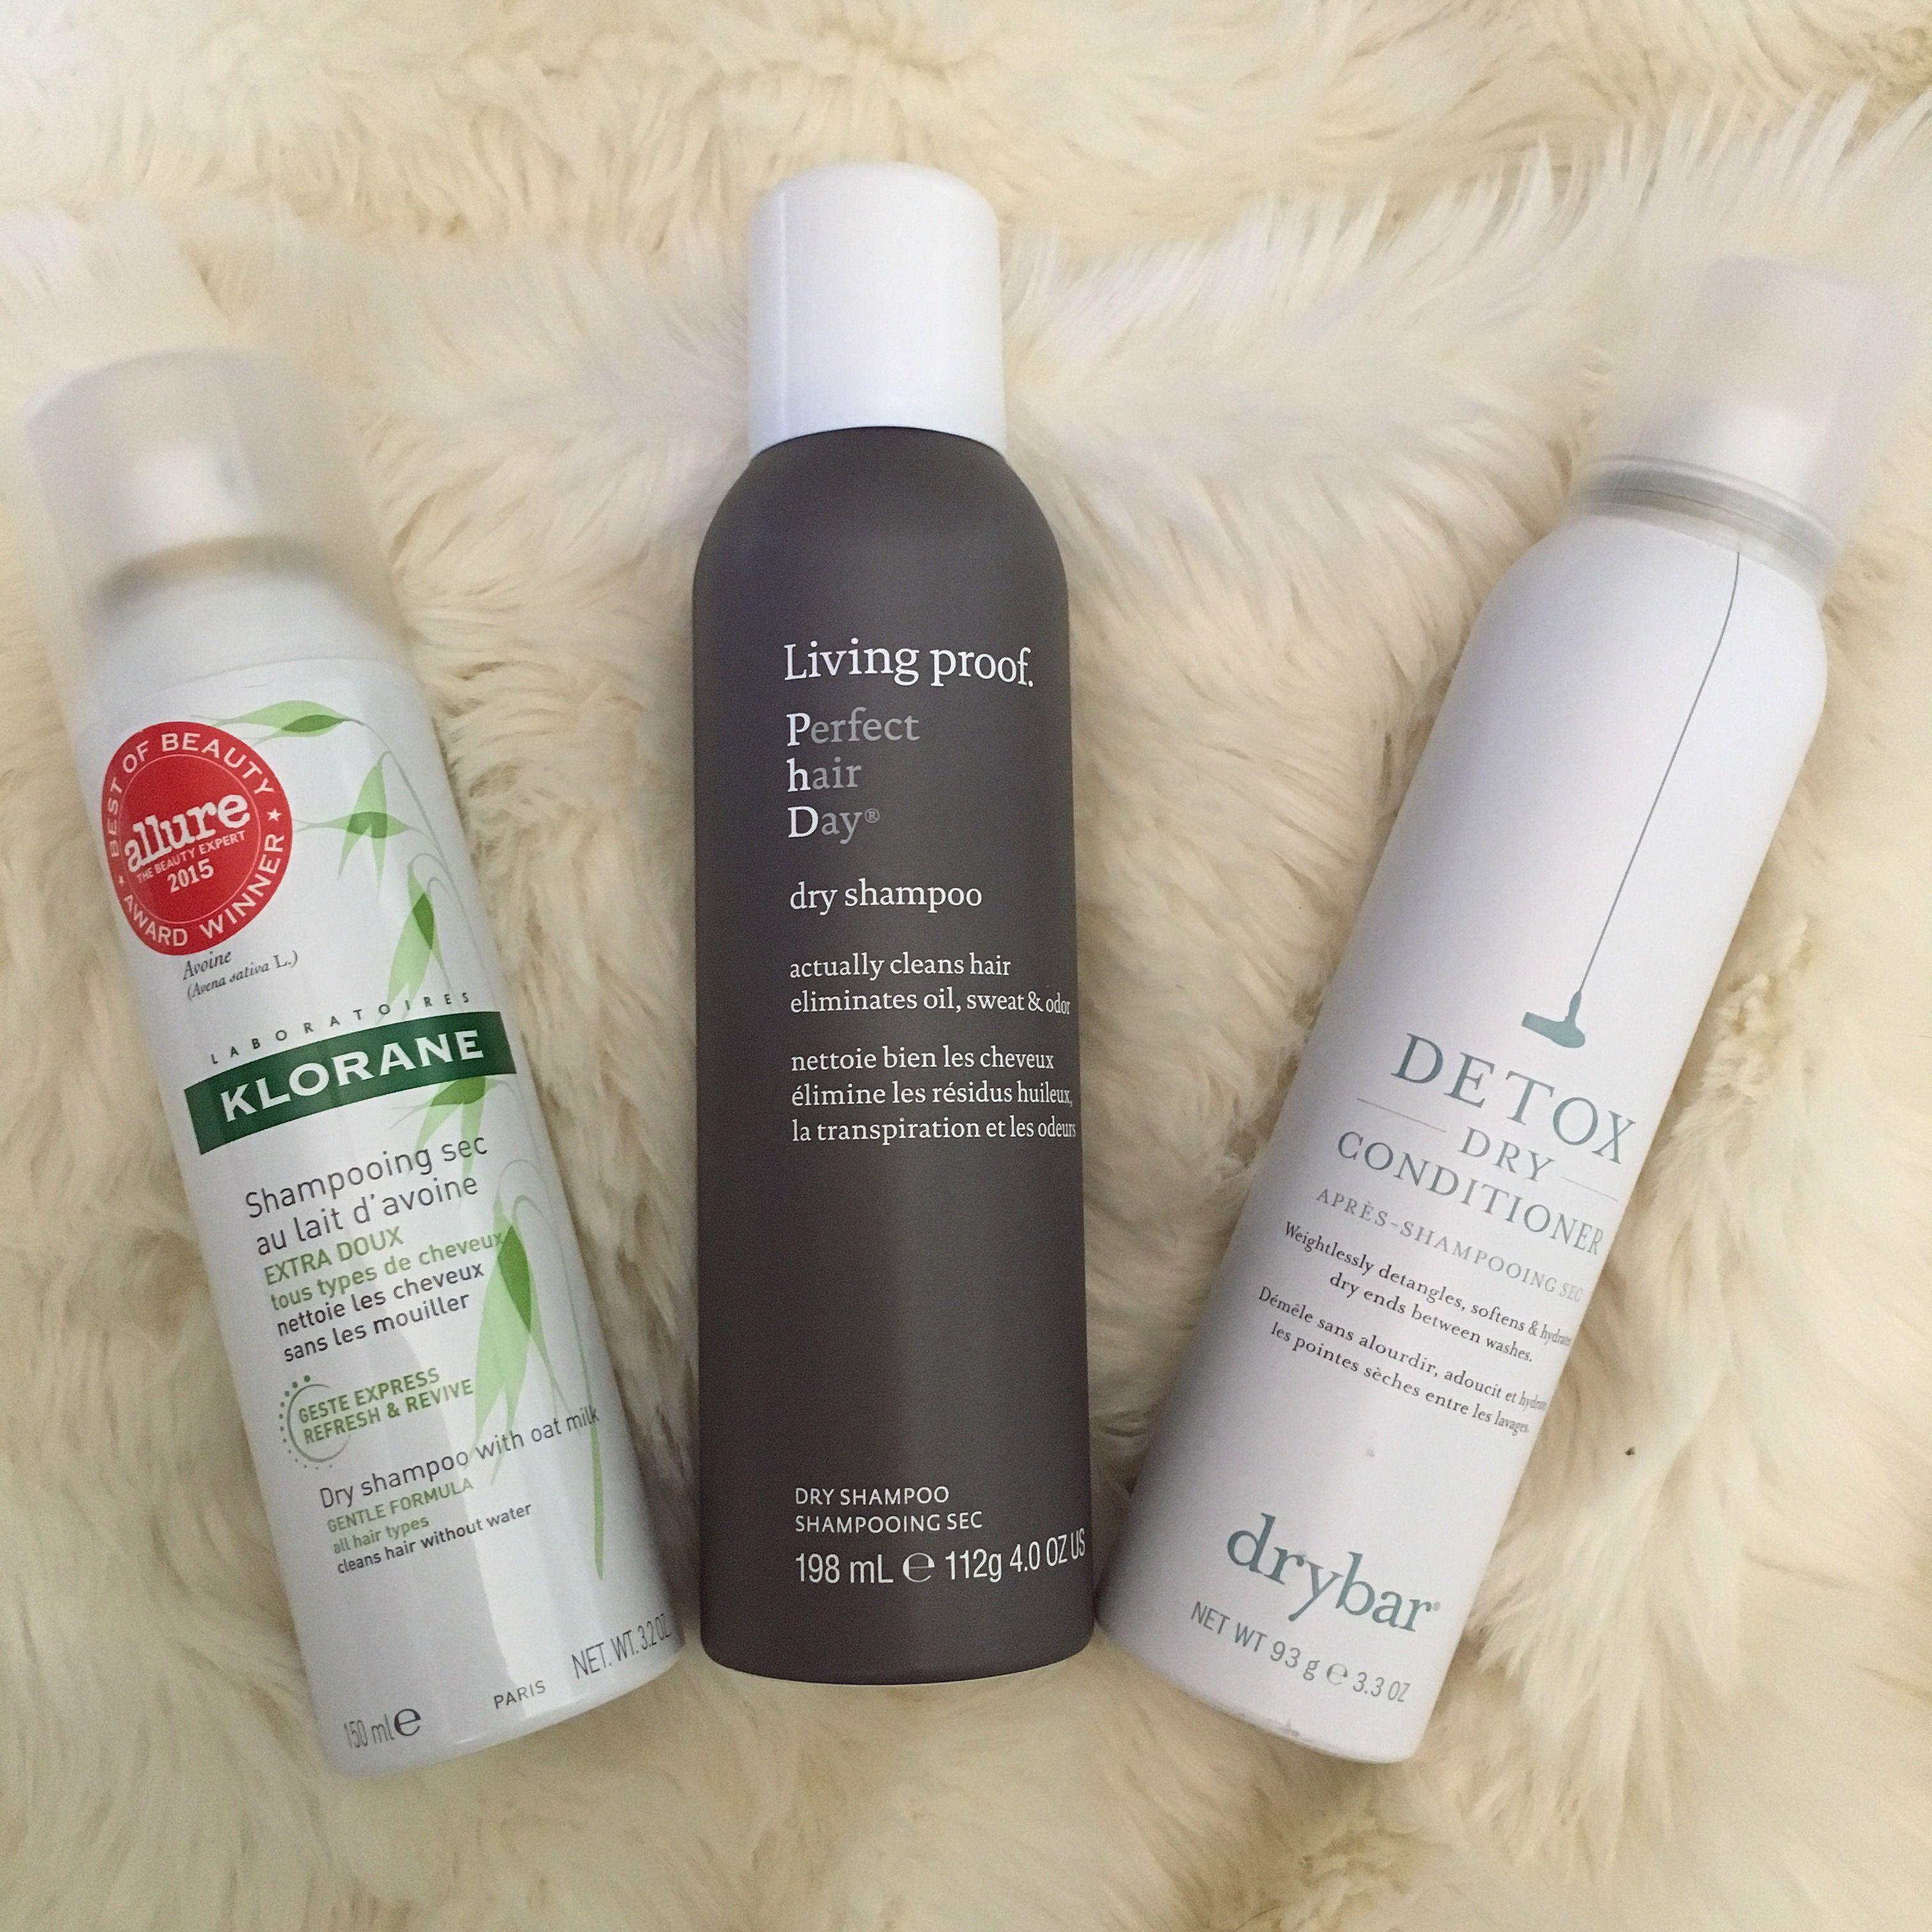 My Favorite Dry Shampoos Dry Shampoo Klorane Dry Shampoo Dry Conditioner